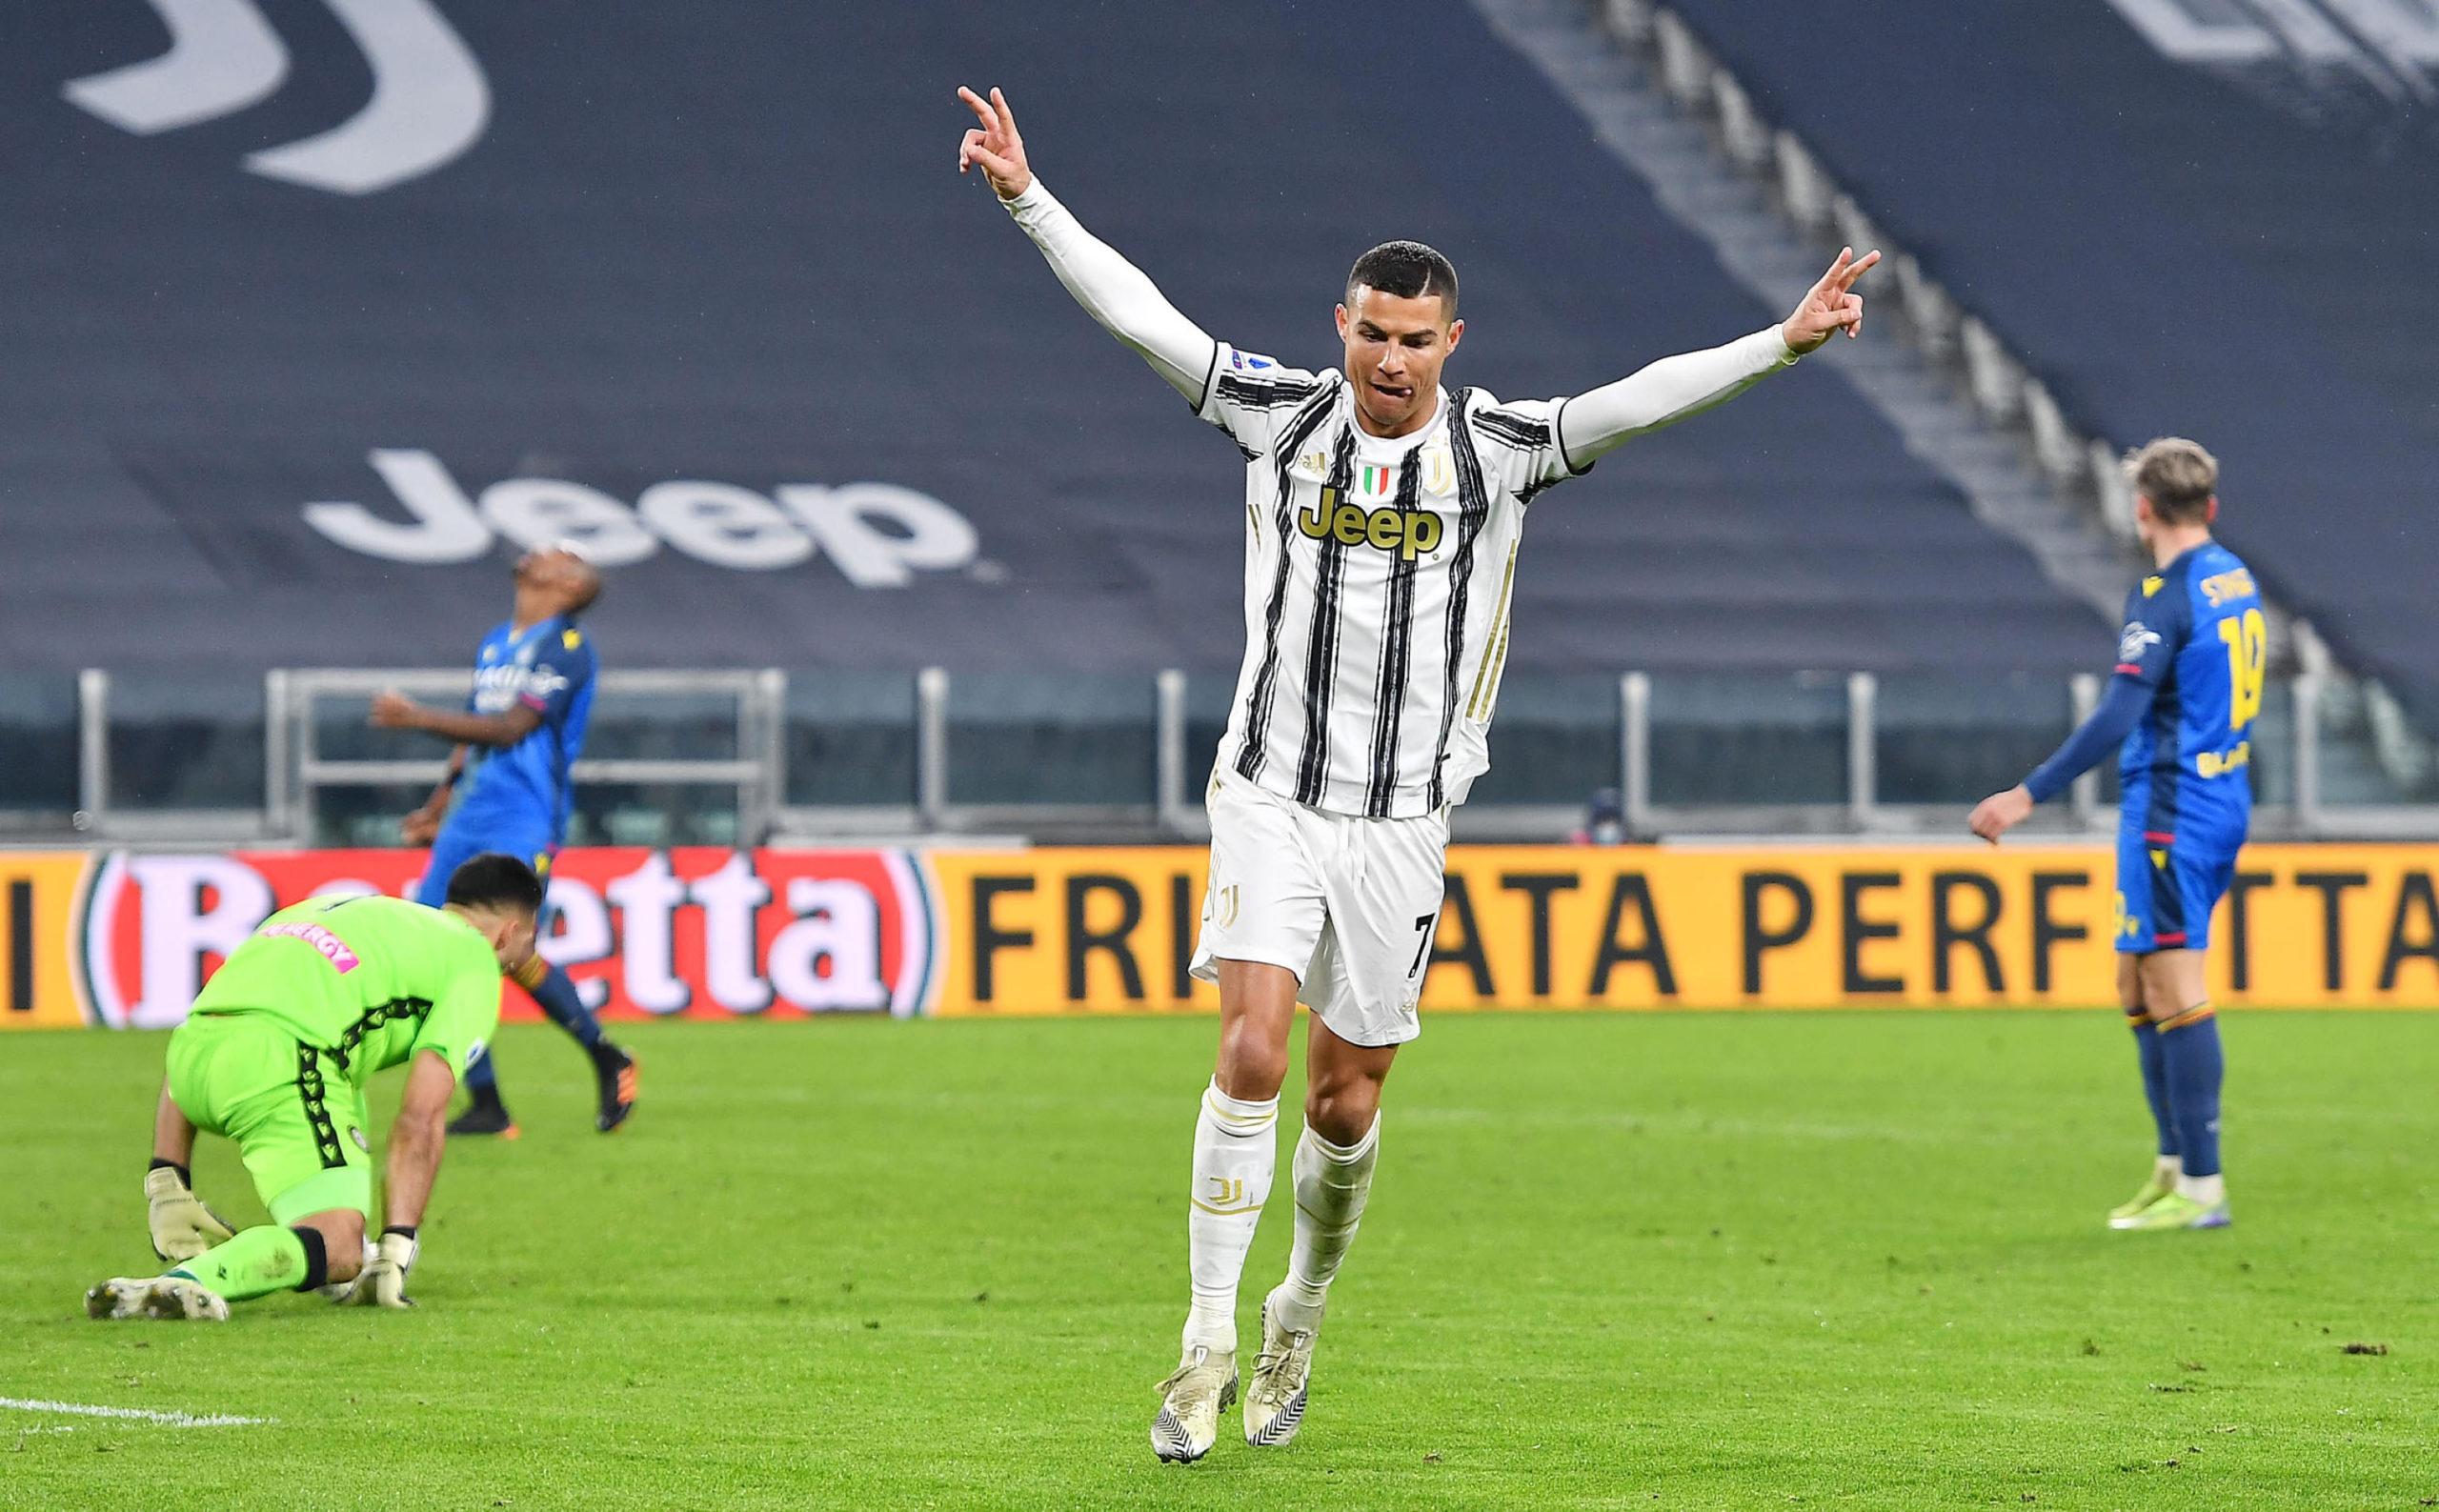 Cristiano Ronaldo celebrates one of his 29 Serie A goals this season